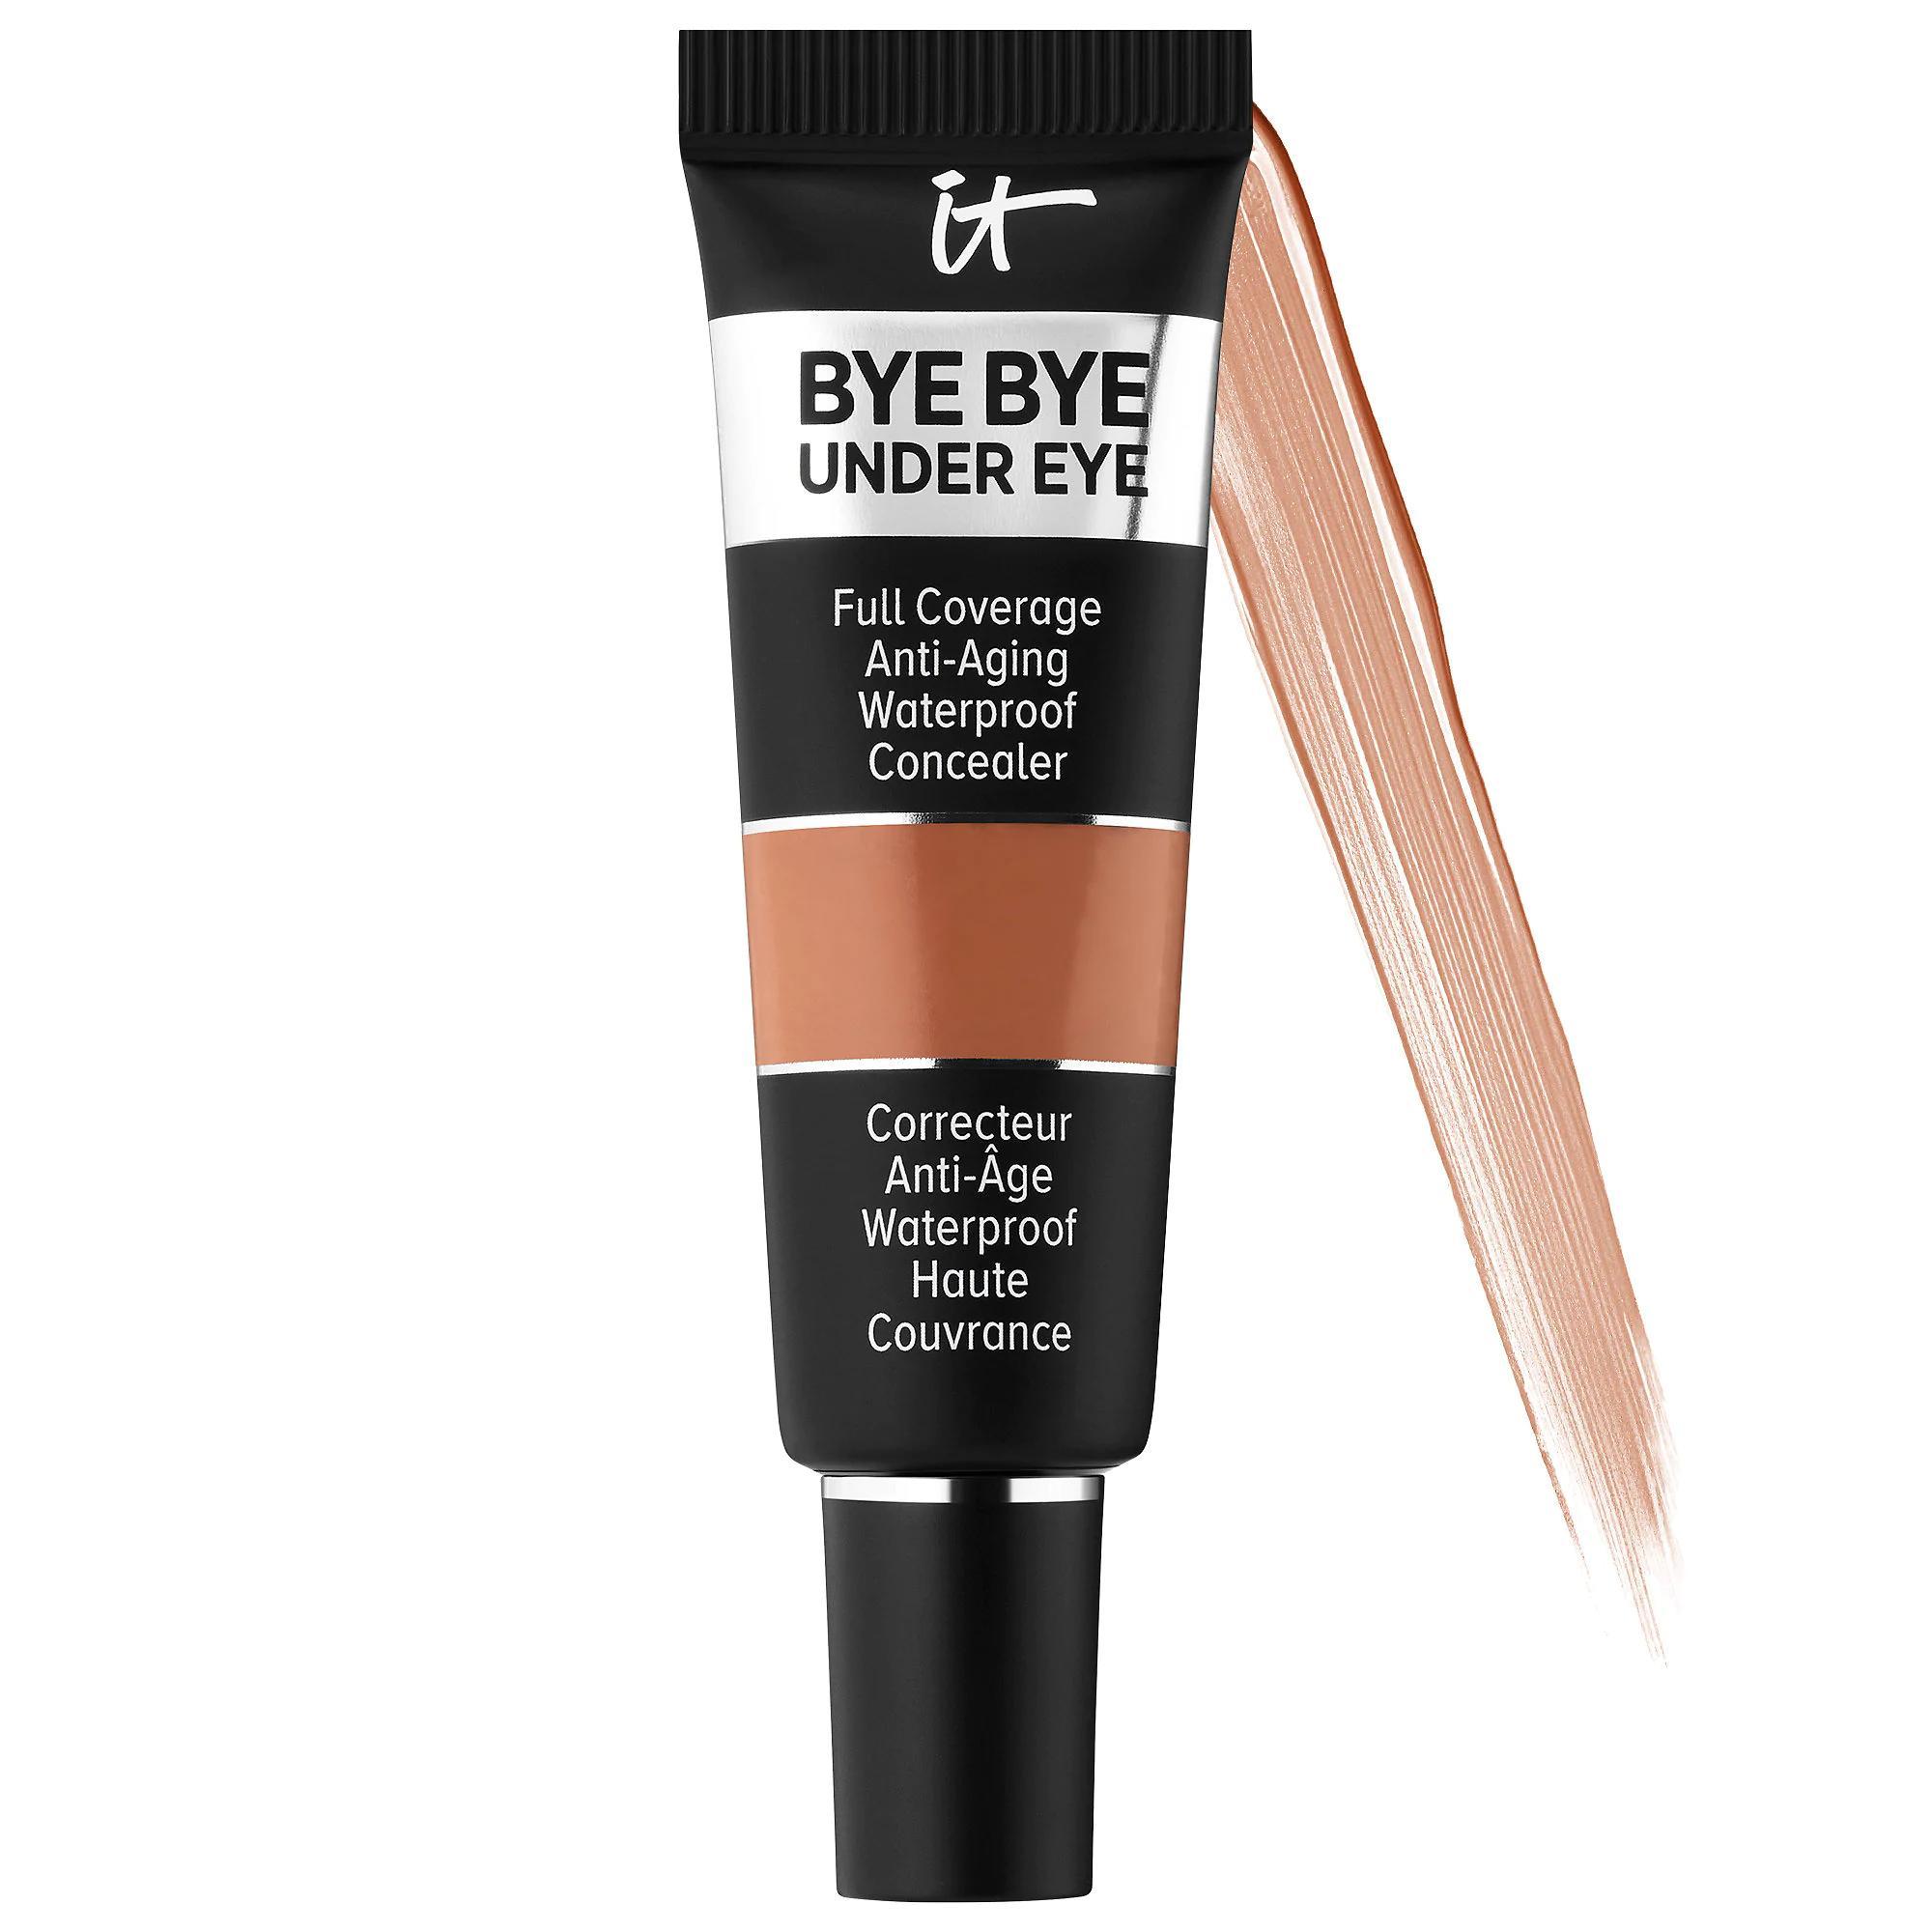 IT Cosmetics Bye Bye Under Eye Concealer Rich Amber 35.0